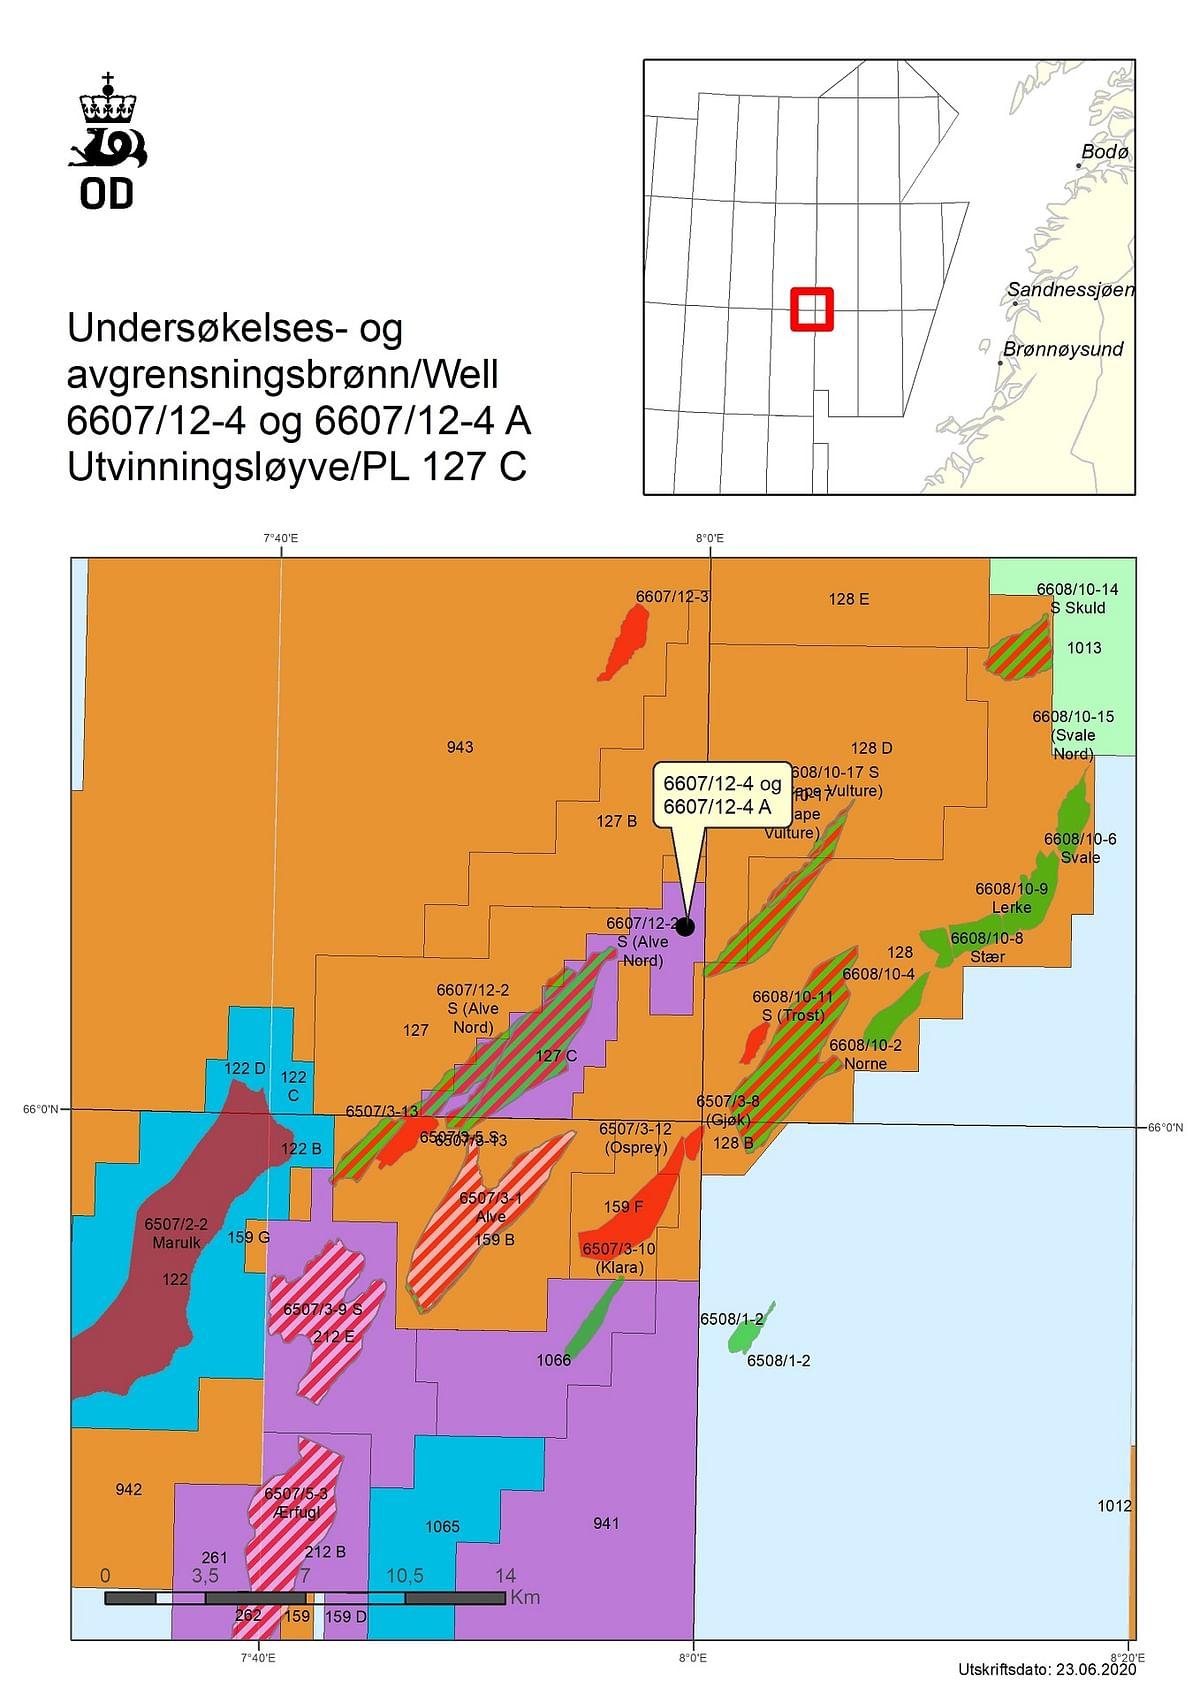 Aker BP Discovers Gas & Oil near Alve Nord in Norwegian Sea